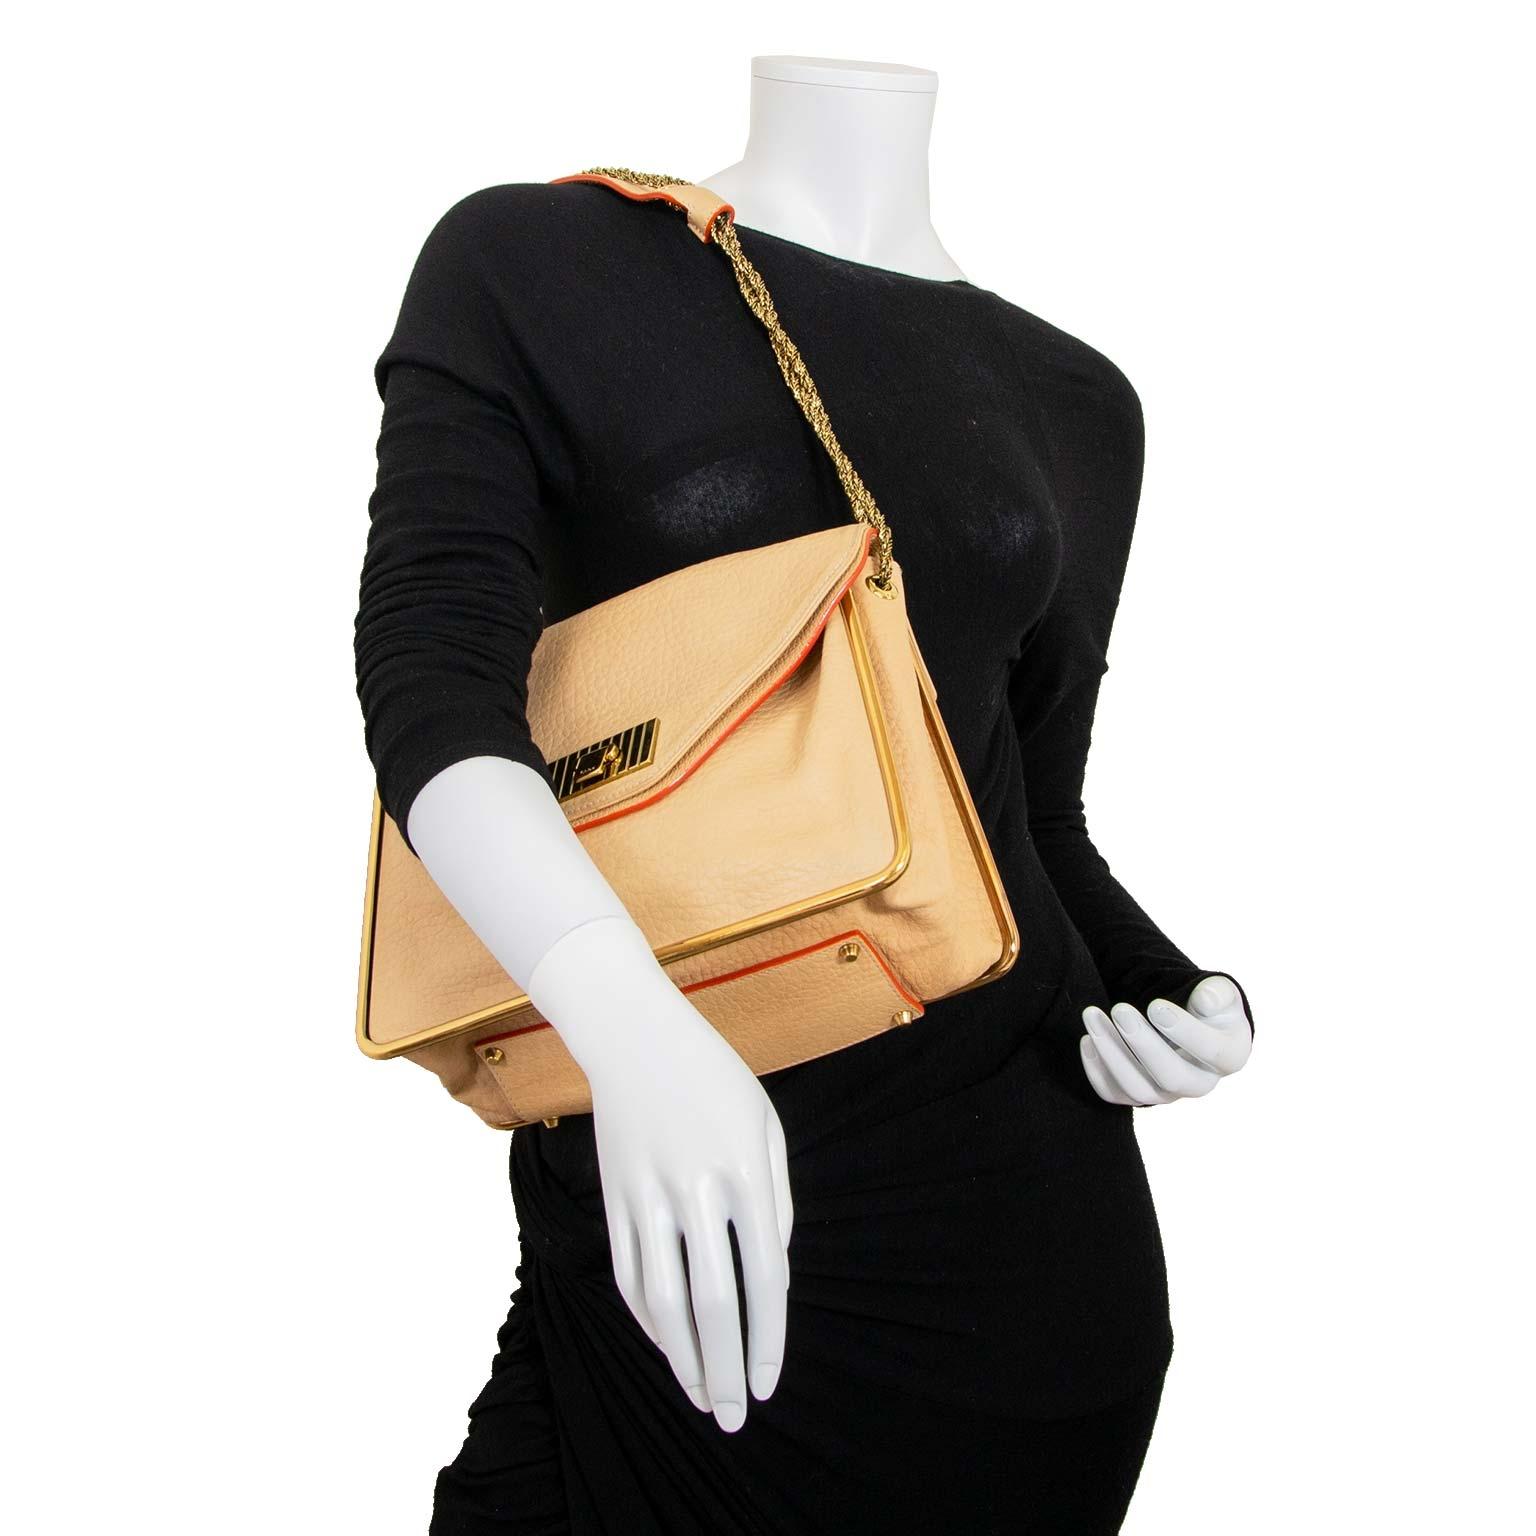 Chloé Beige Sally Bag now for sale at labellov vintage fashion webshop belgium